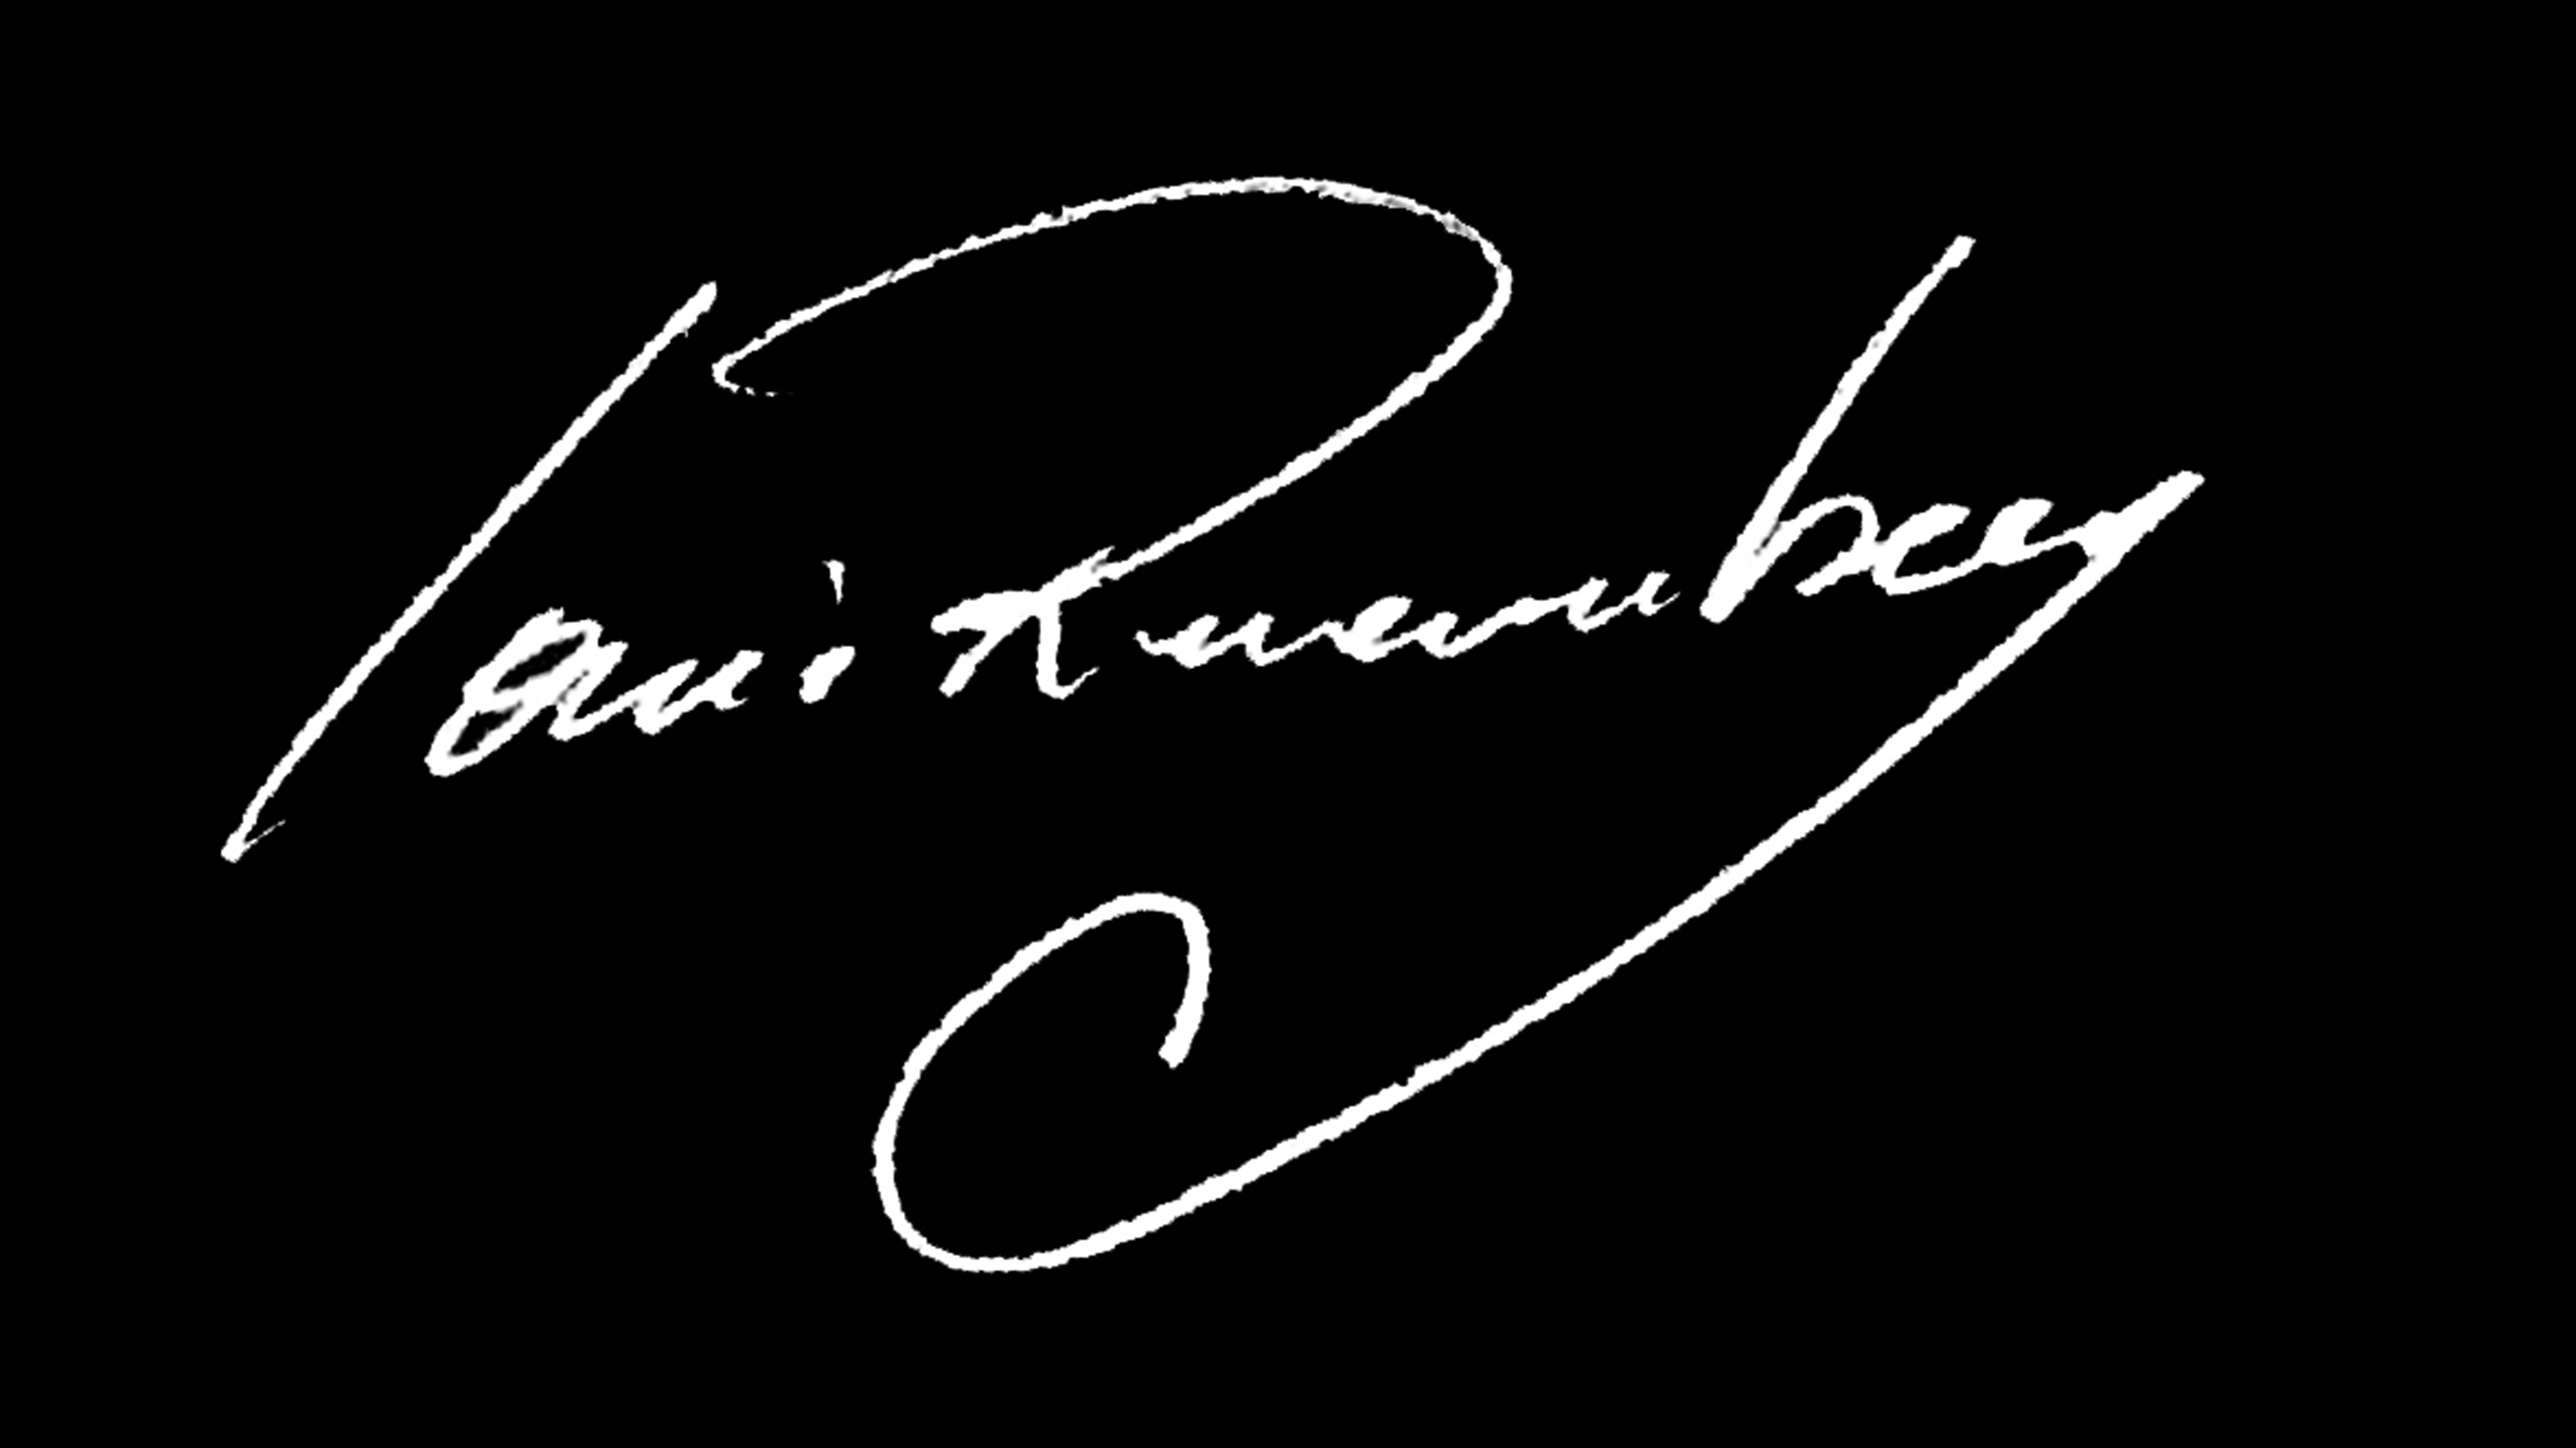 LOUIS runemberg's Signature